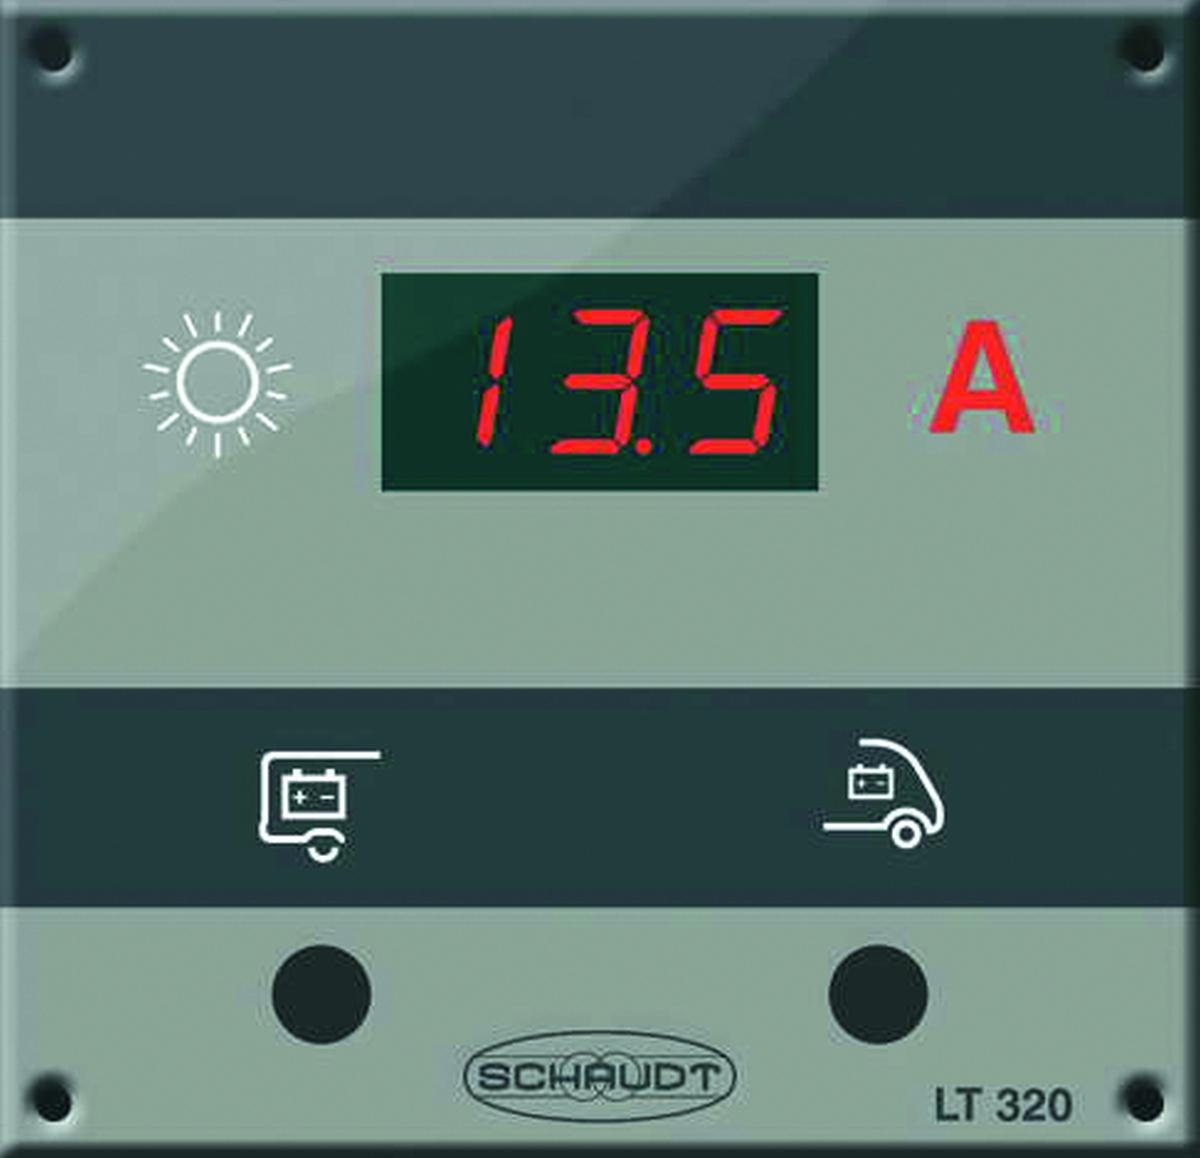 Schaudt Kontrolltafel LT 320 Solar